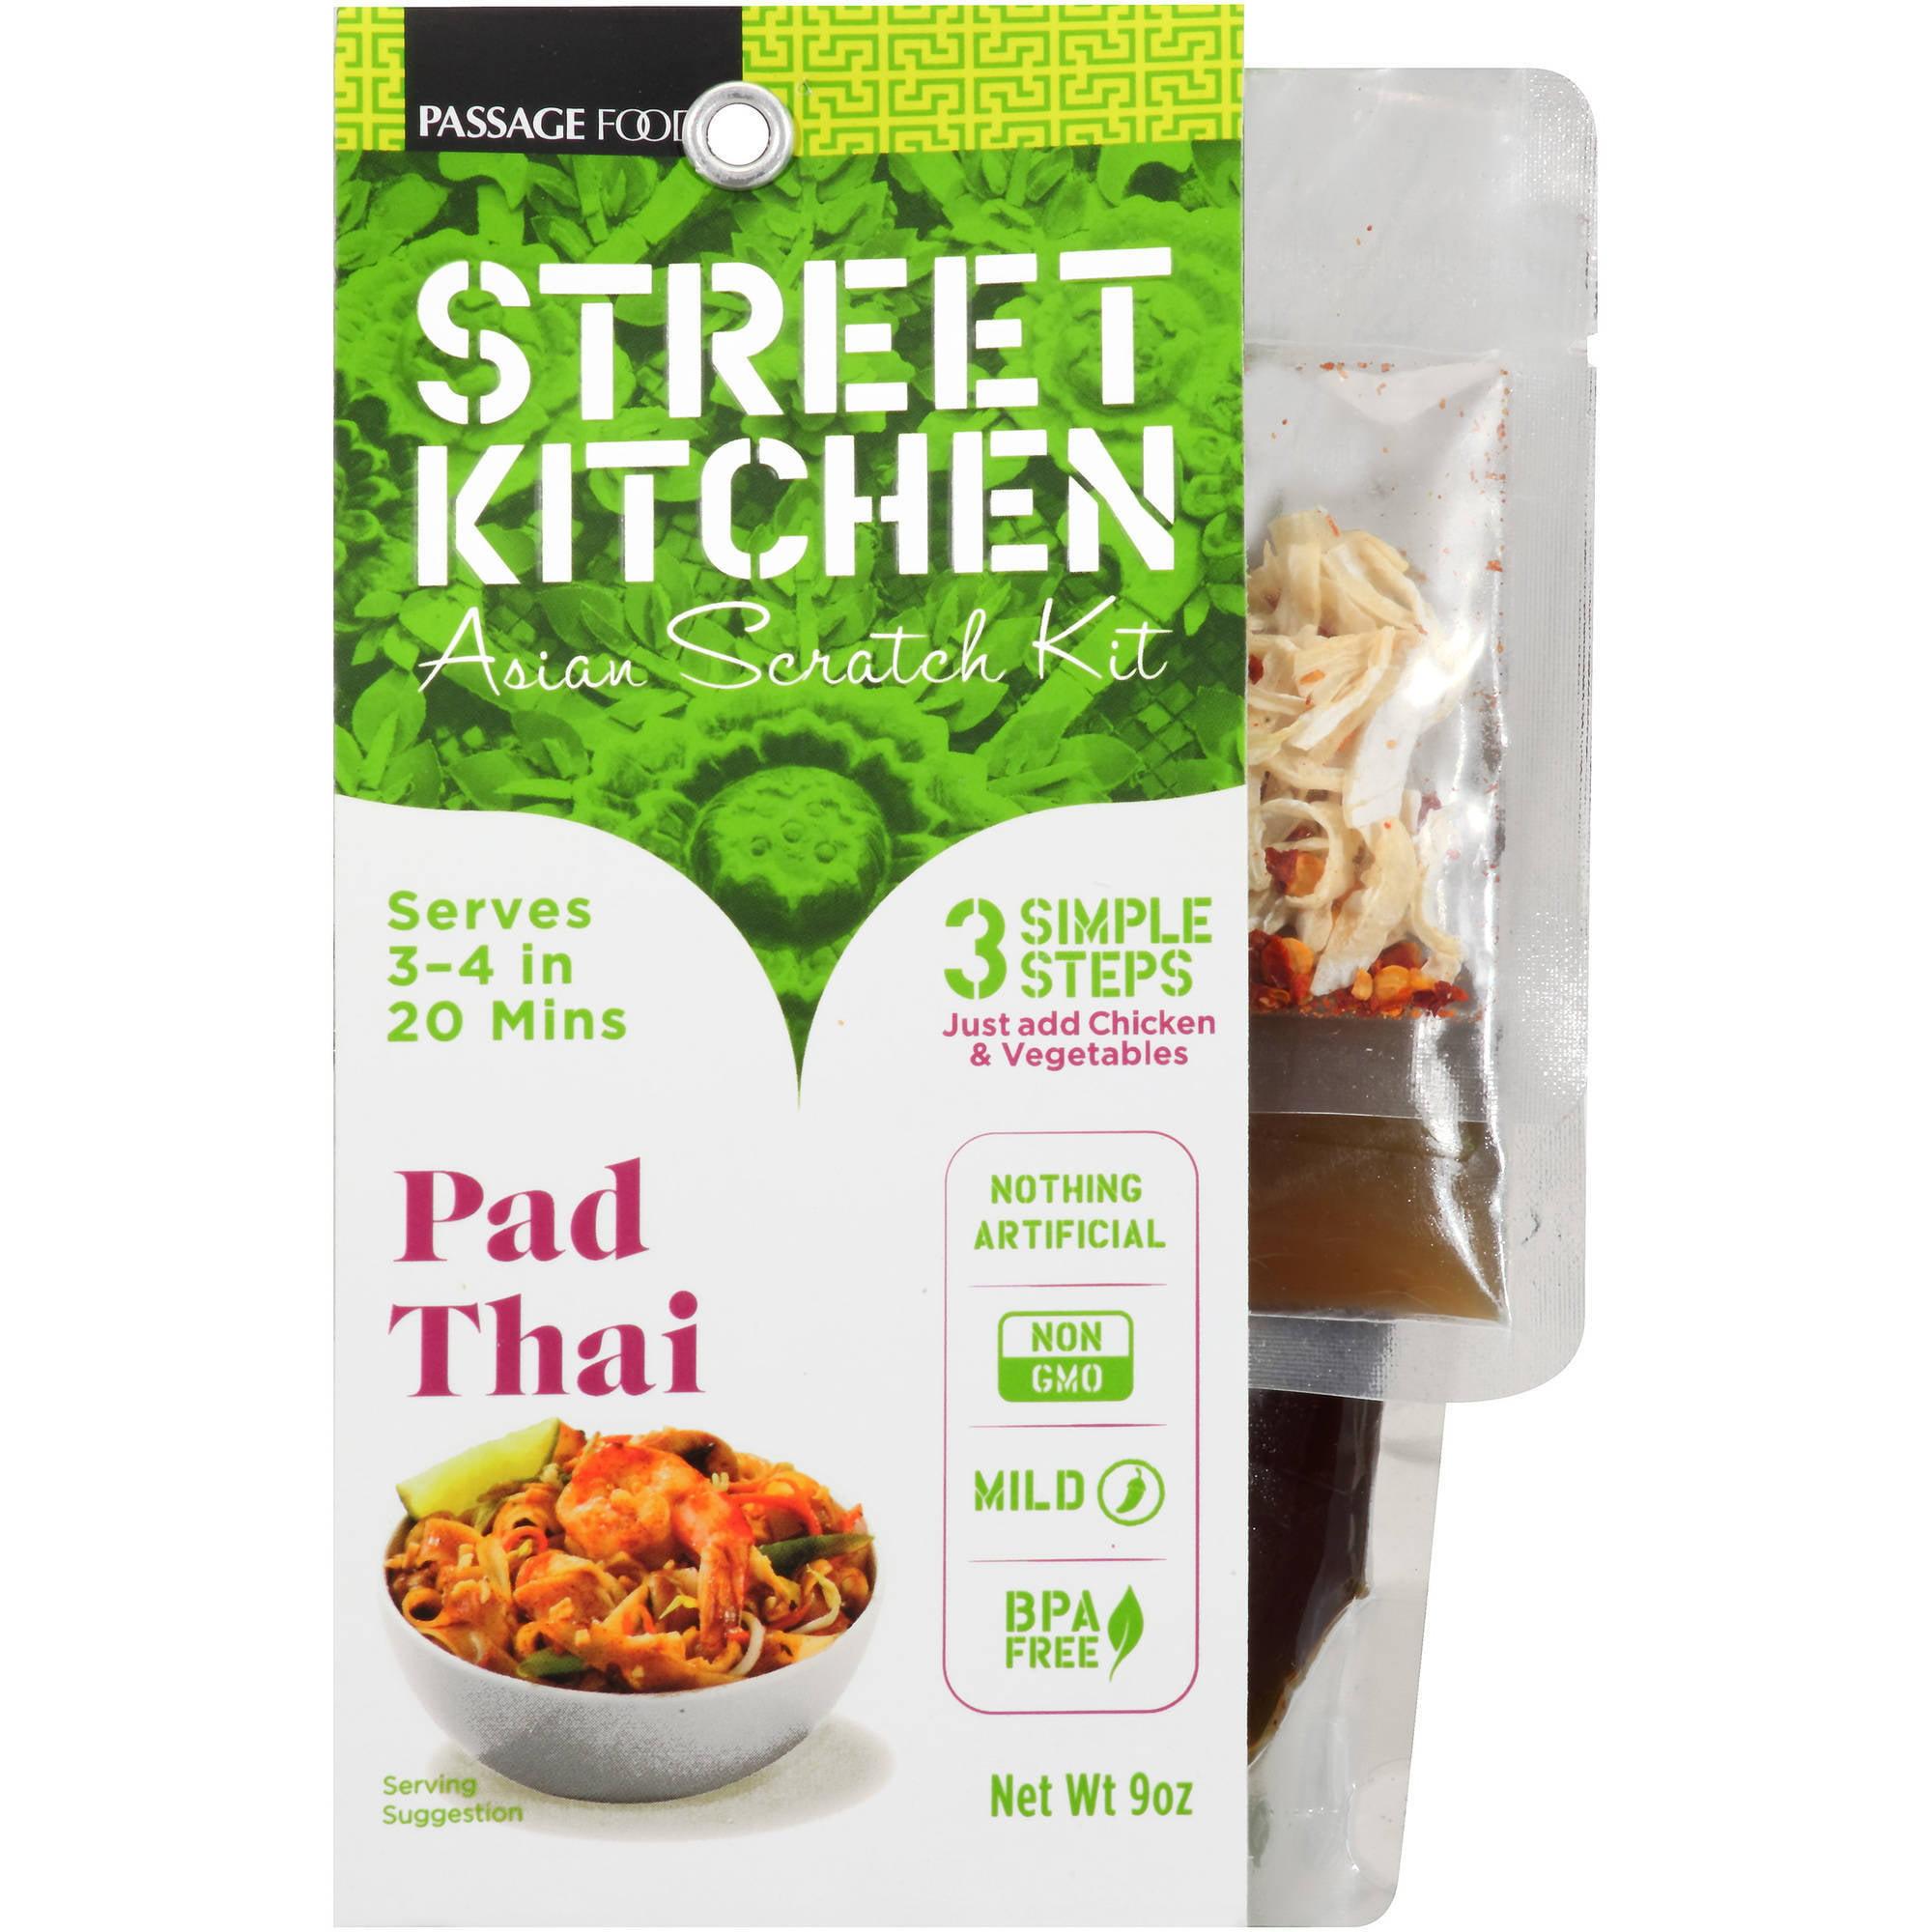 street kitchen pad thai asian scratch kit, 9 oz - walmart